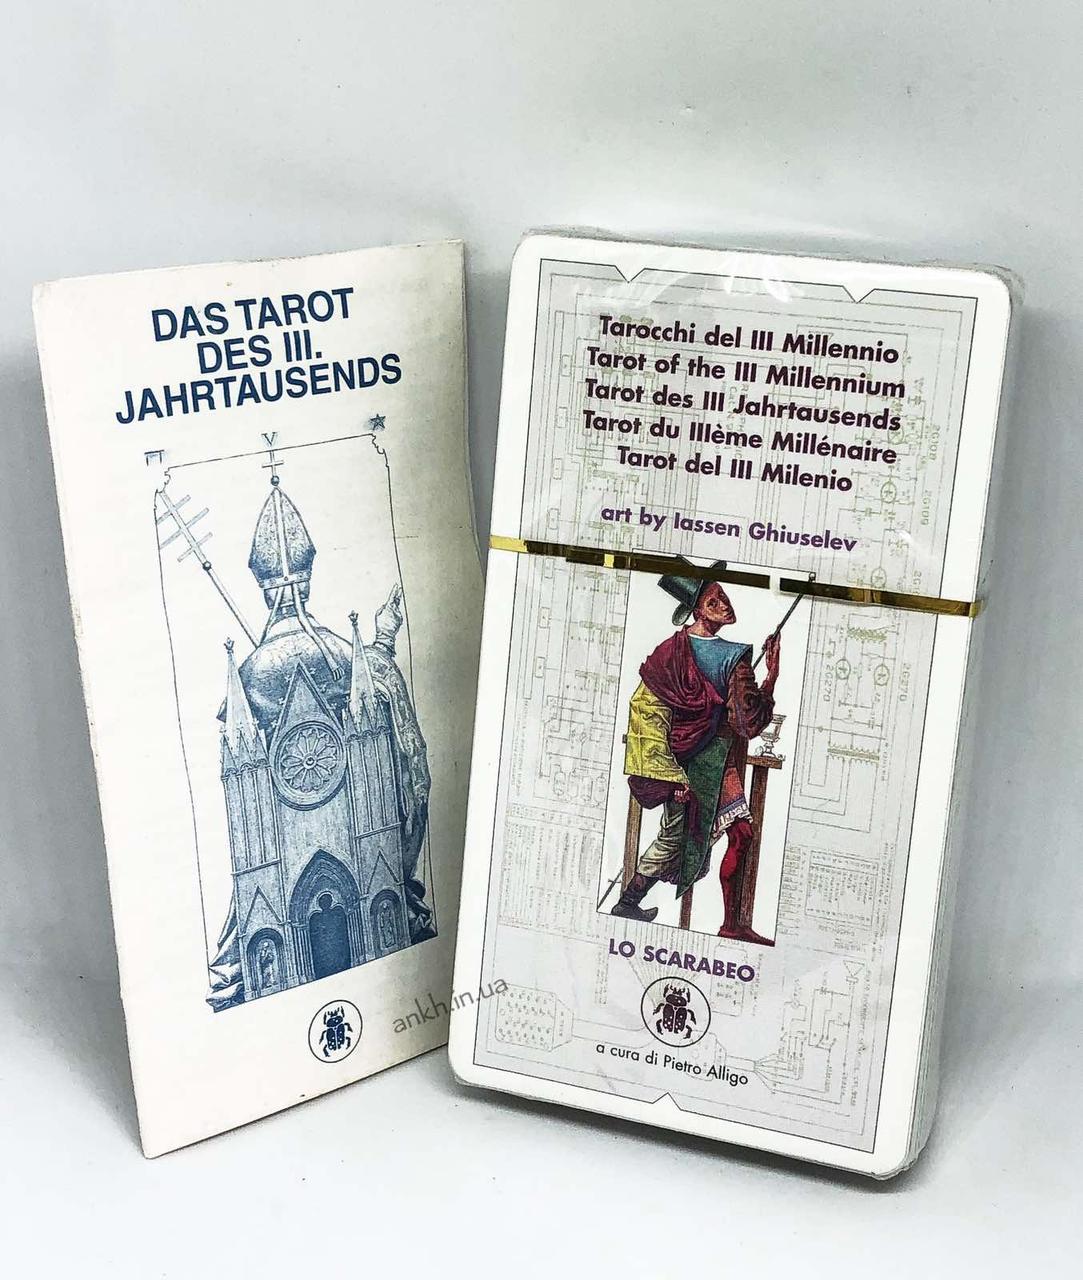 Das Tarot des III. Jahrtausends/ Tarot of the III Millennium/ Таро III Тысячелетия